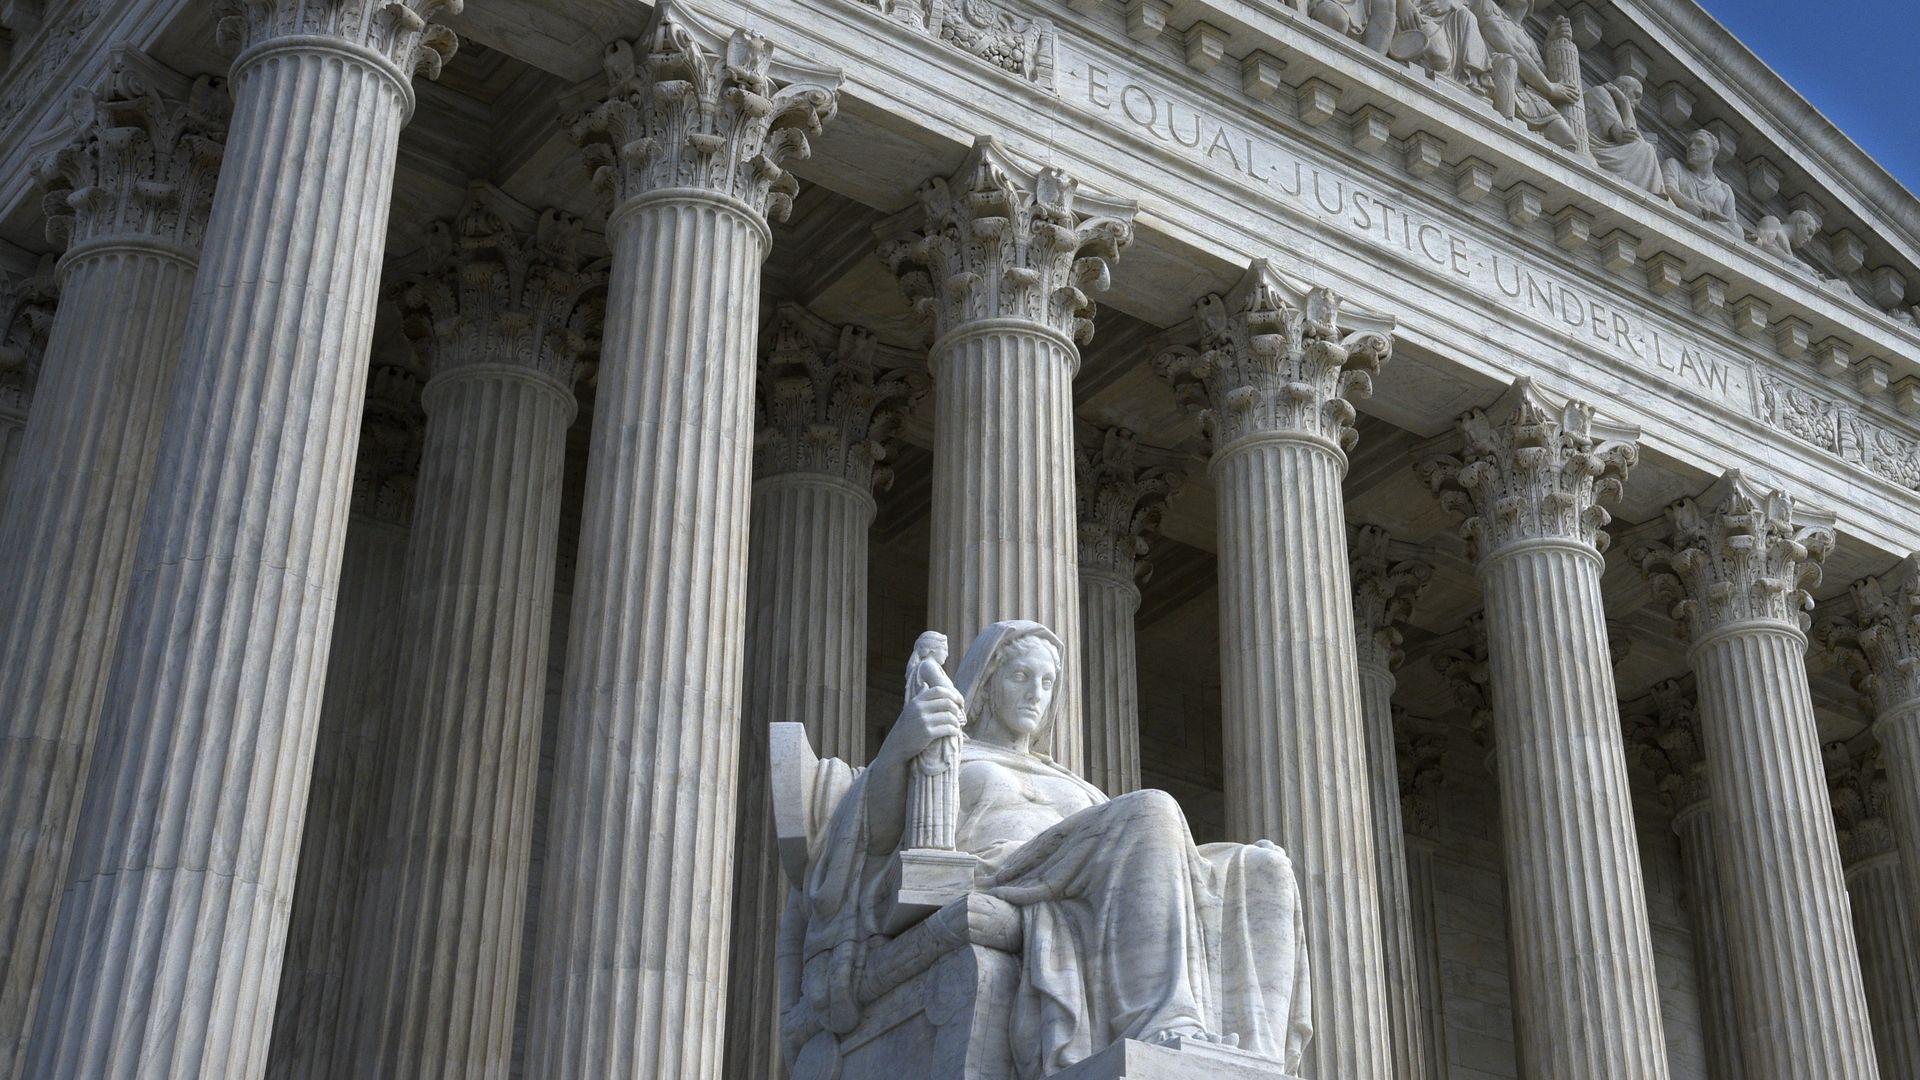 The U.S. Supreme Court Building in Washington, D.C